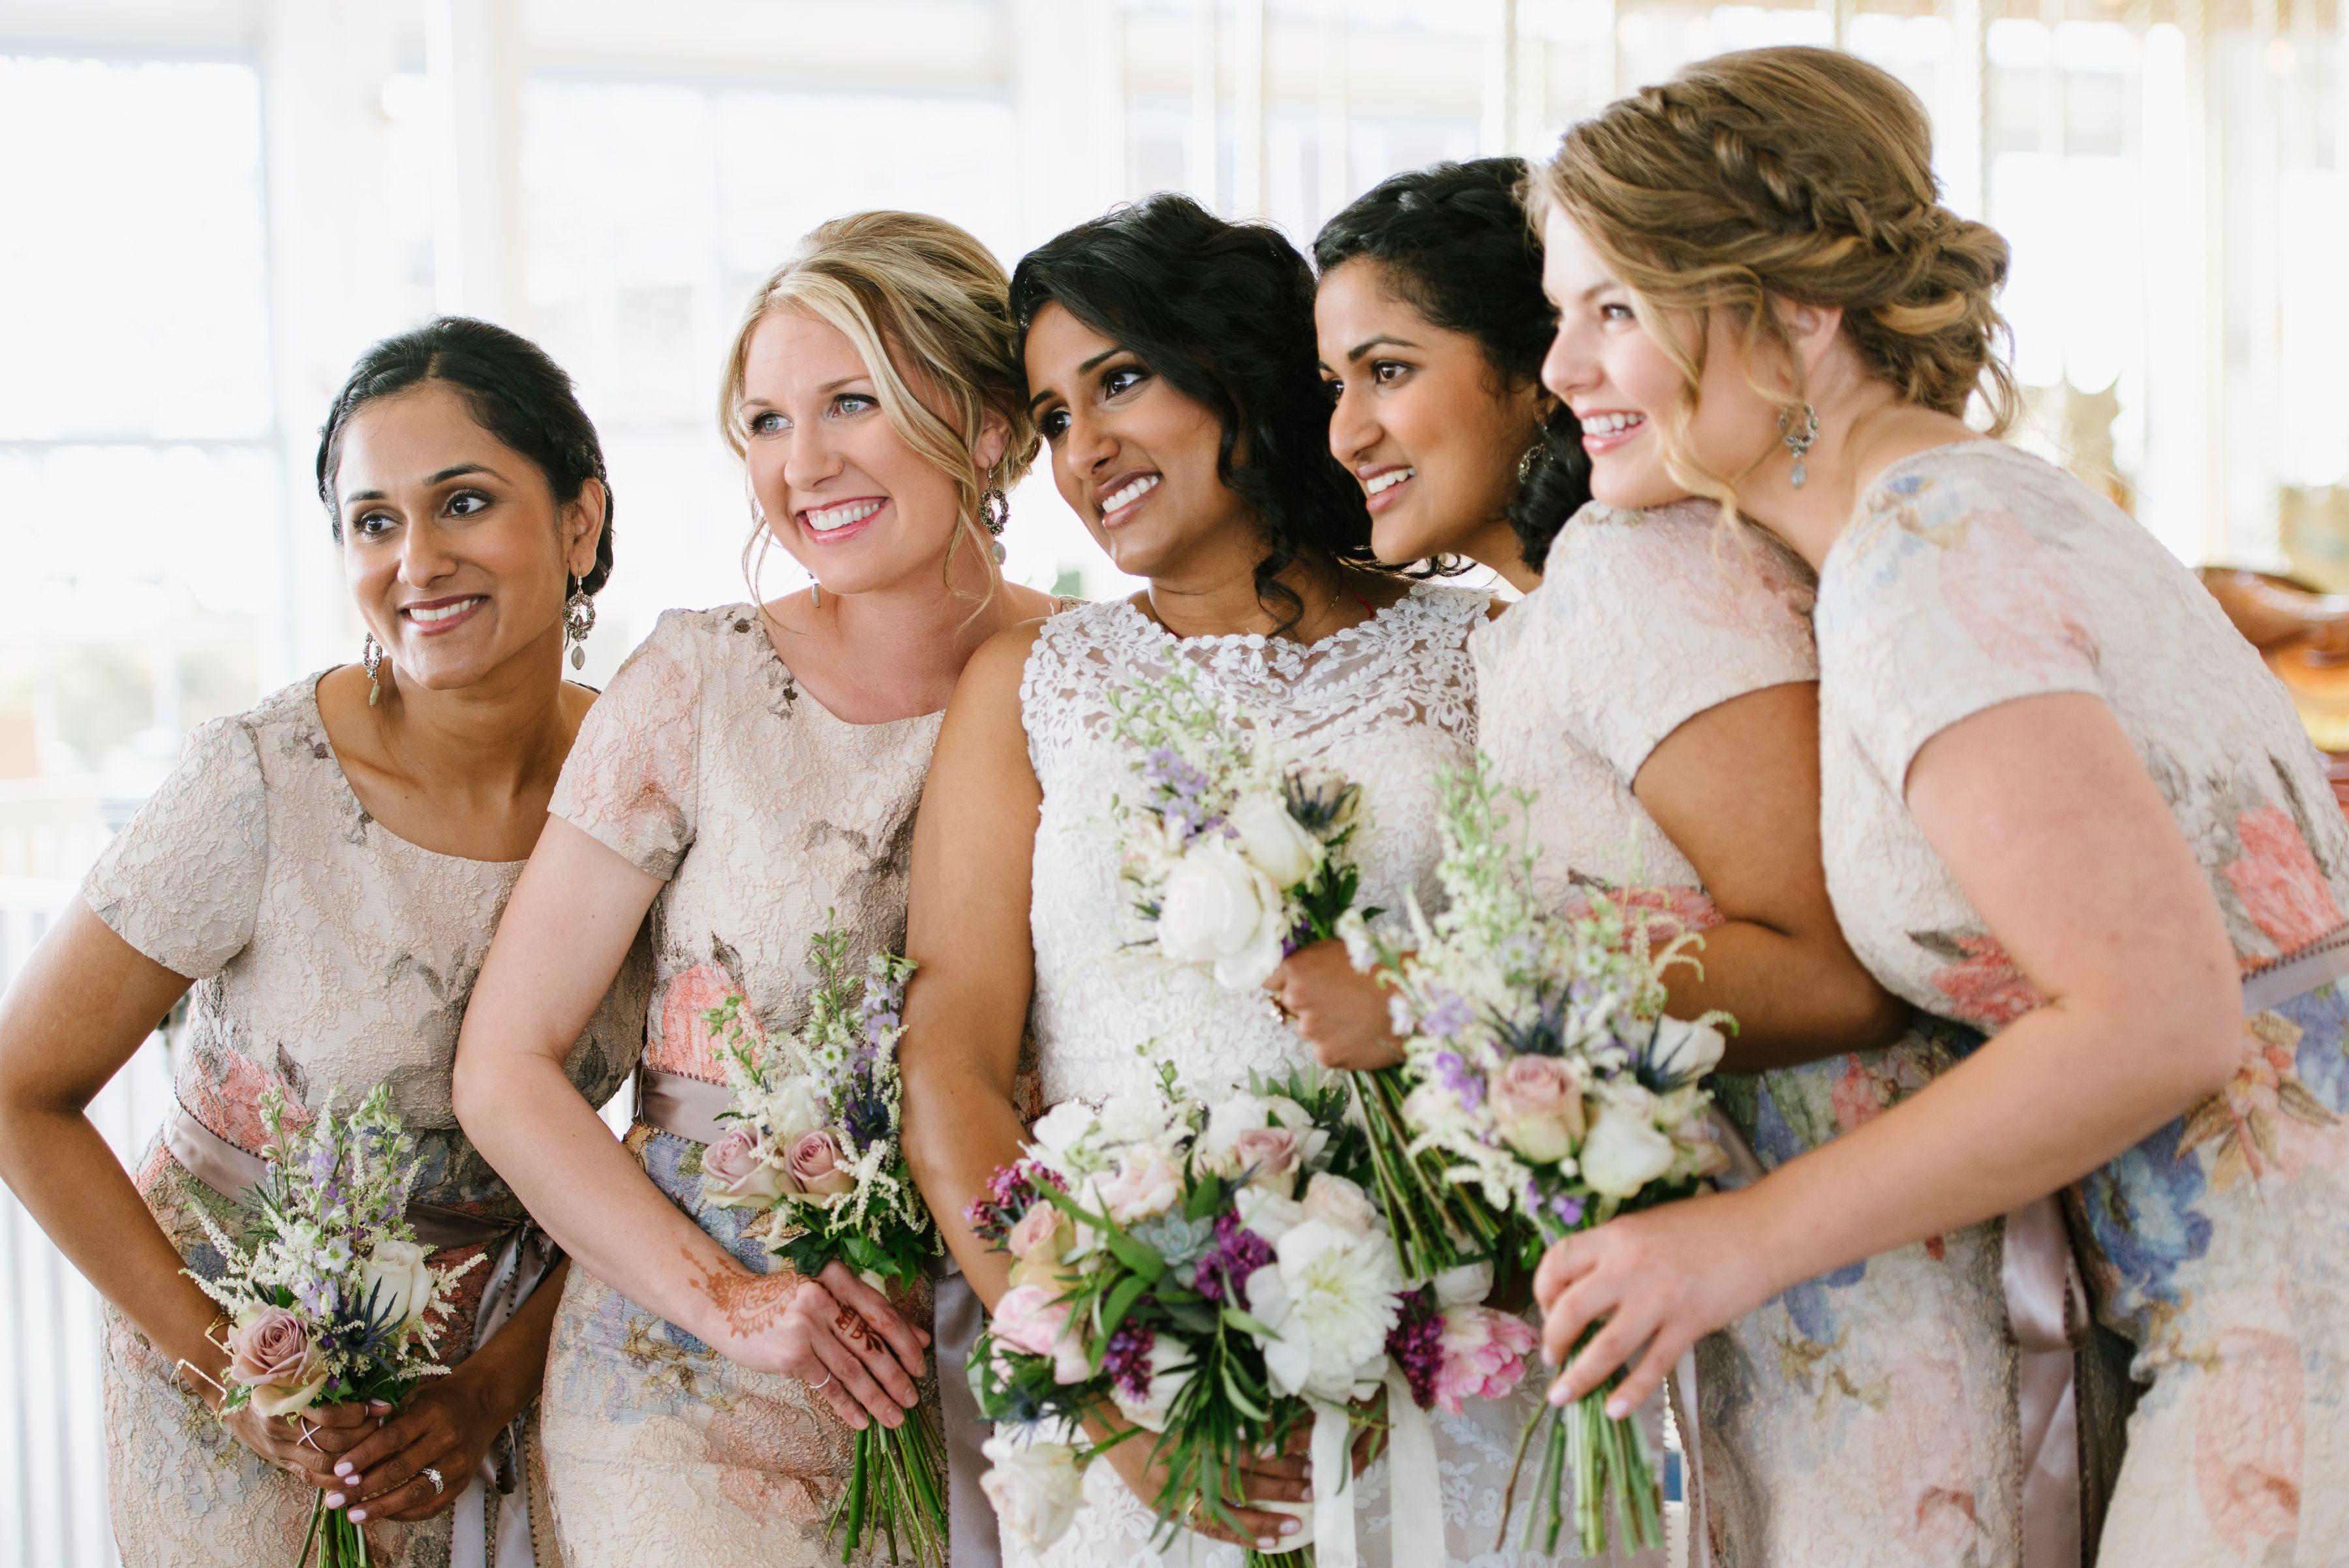 Bridal party floral bridesmaid dresses olivia gird photography bridal party floral bridesmaid dresses olivia gird photography ombrellifo Image collections